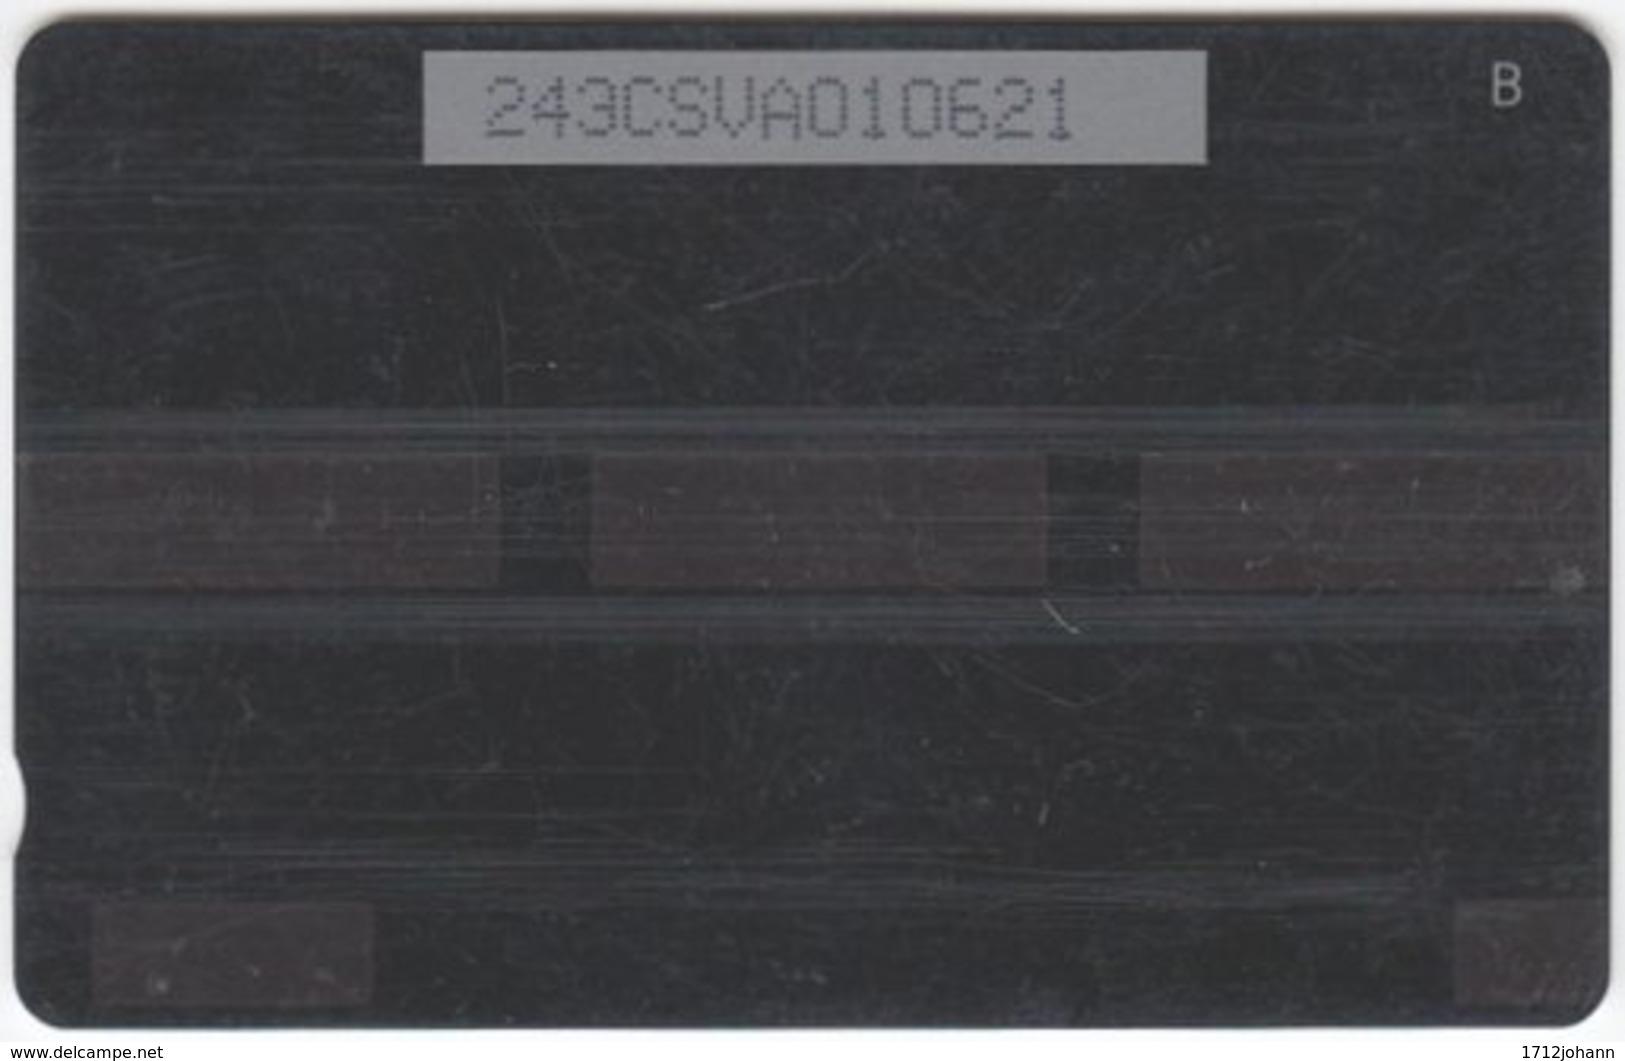 ST. VINCENT & GRENADINES A-052 Magnetic Cable & Wireless - Sport, Cricket - 243CSVA - Used - San Vicente Y Las Granadinas